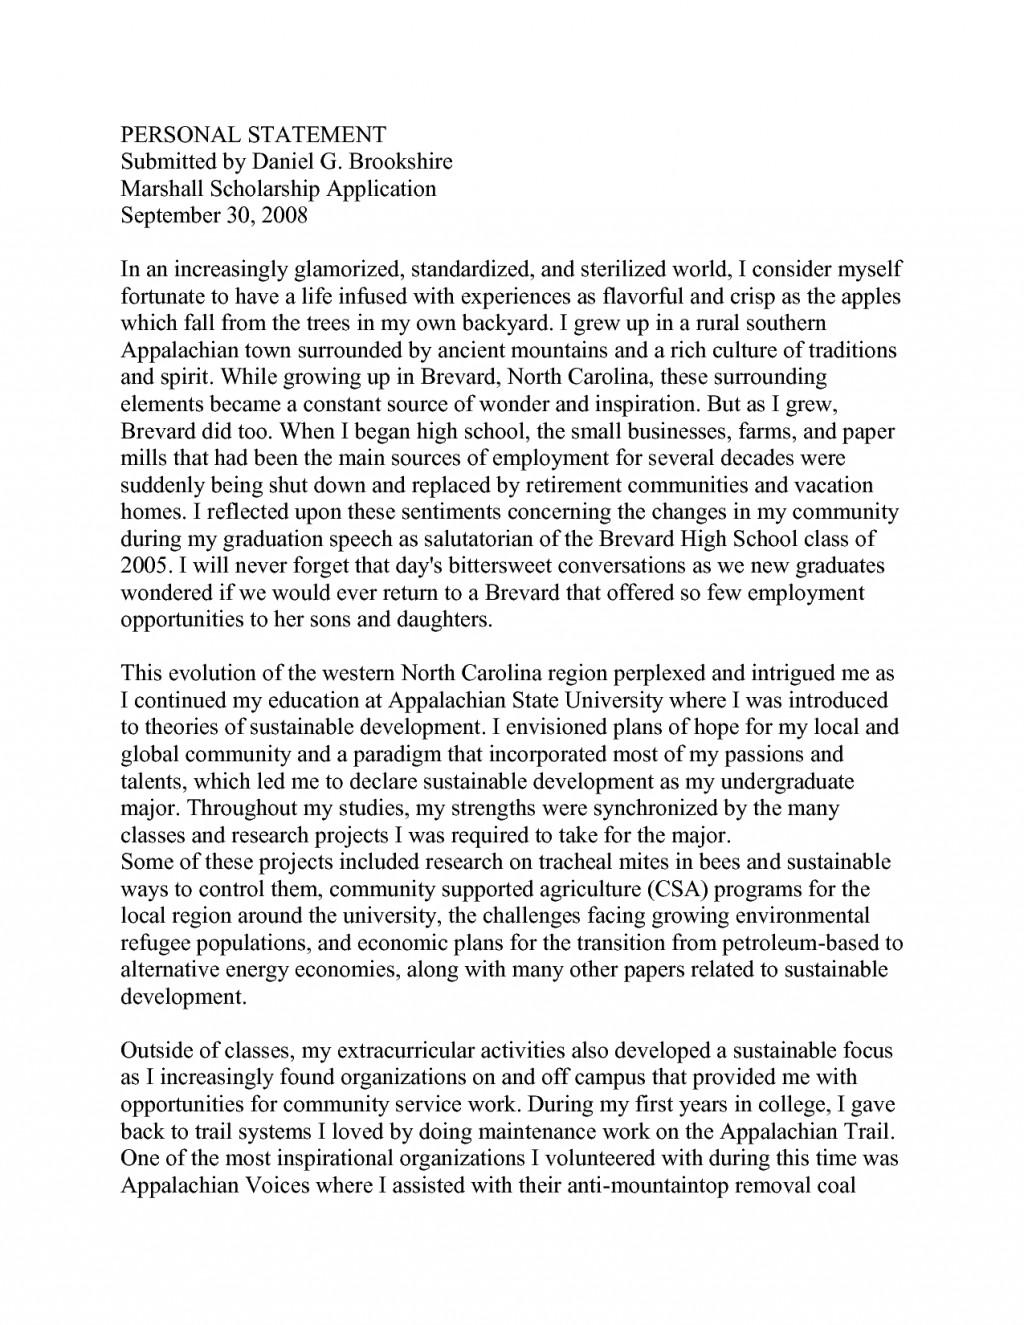 004 Scholarship Personal Statement Template Nsvwiupr Essay Example Header Phenomenal Format Mla Paper Margins Large